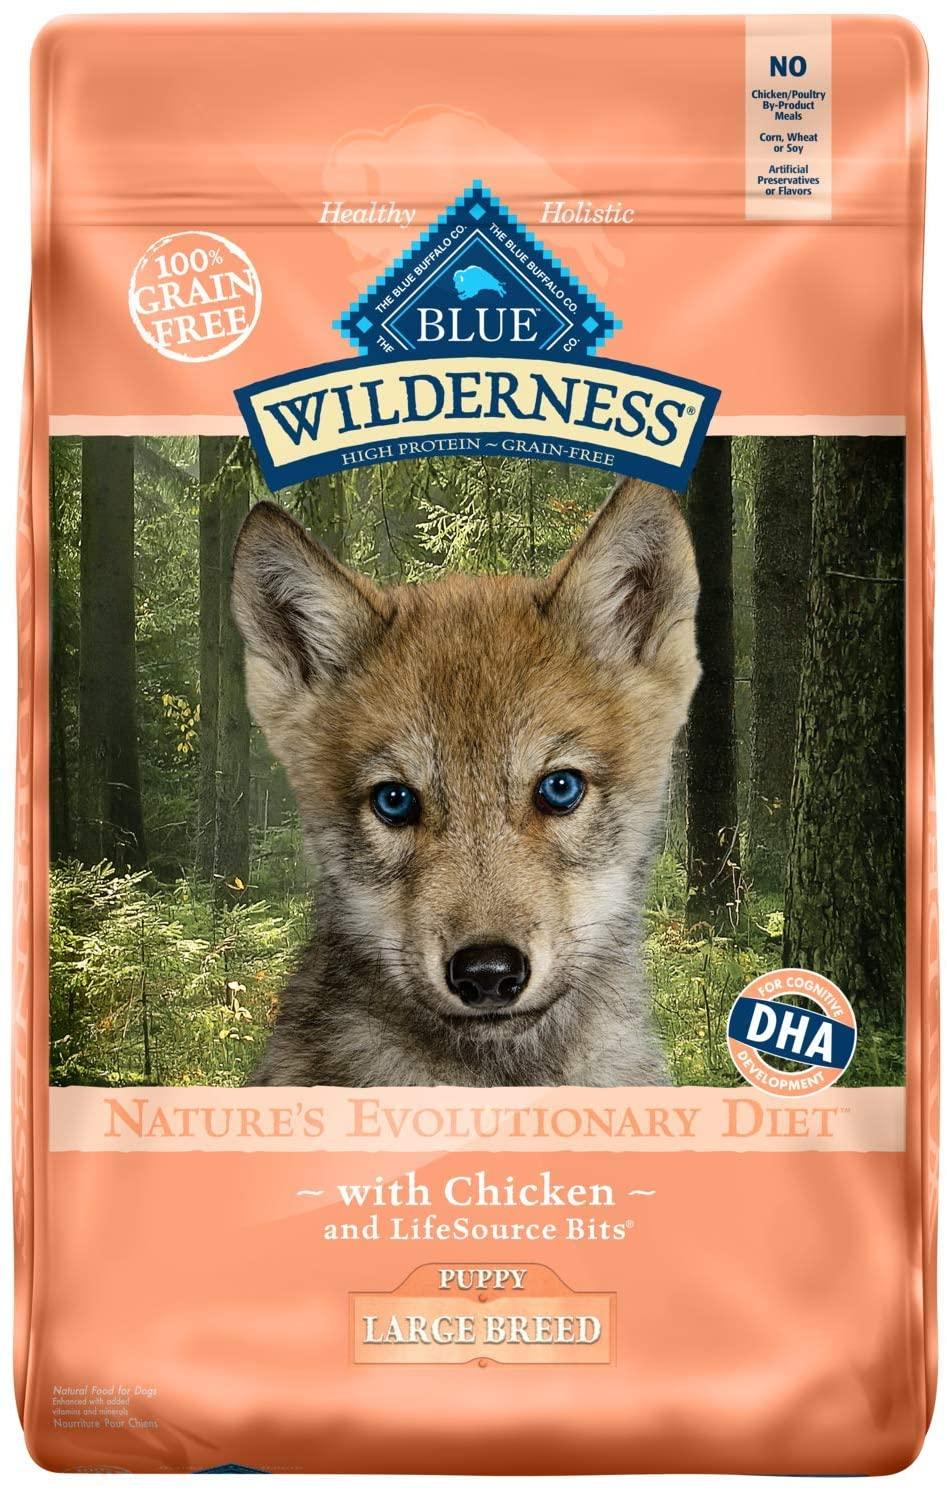 Blue Buffalo Wilderness High Protein Grain-Free Dry Dog Food